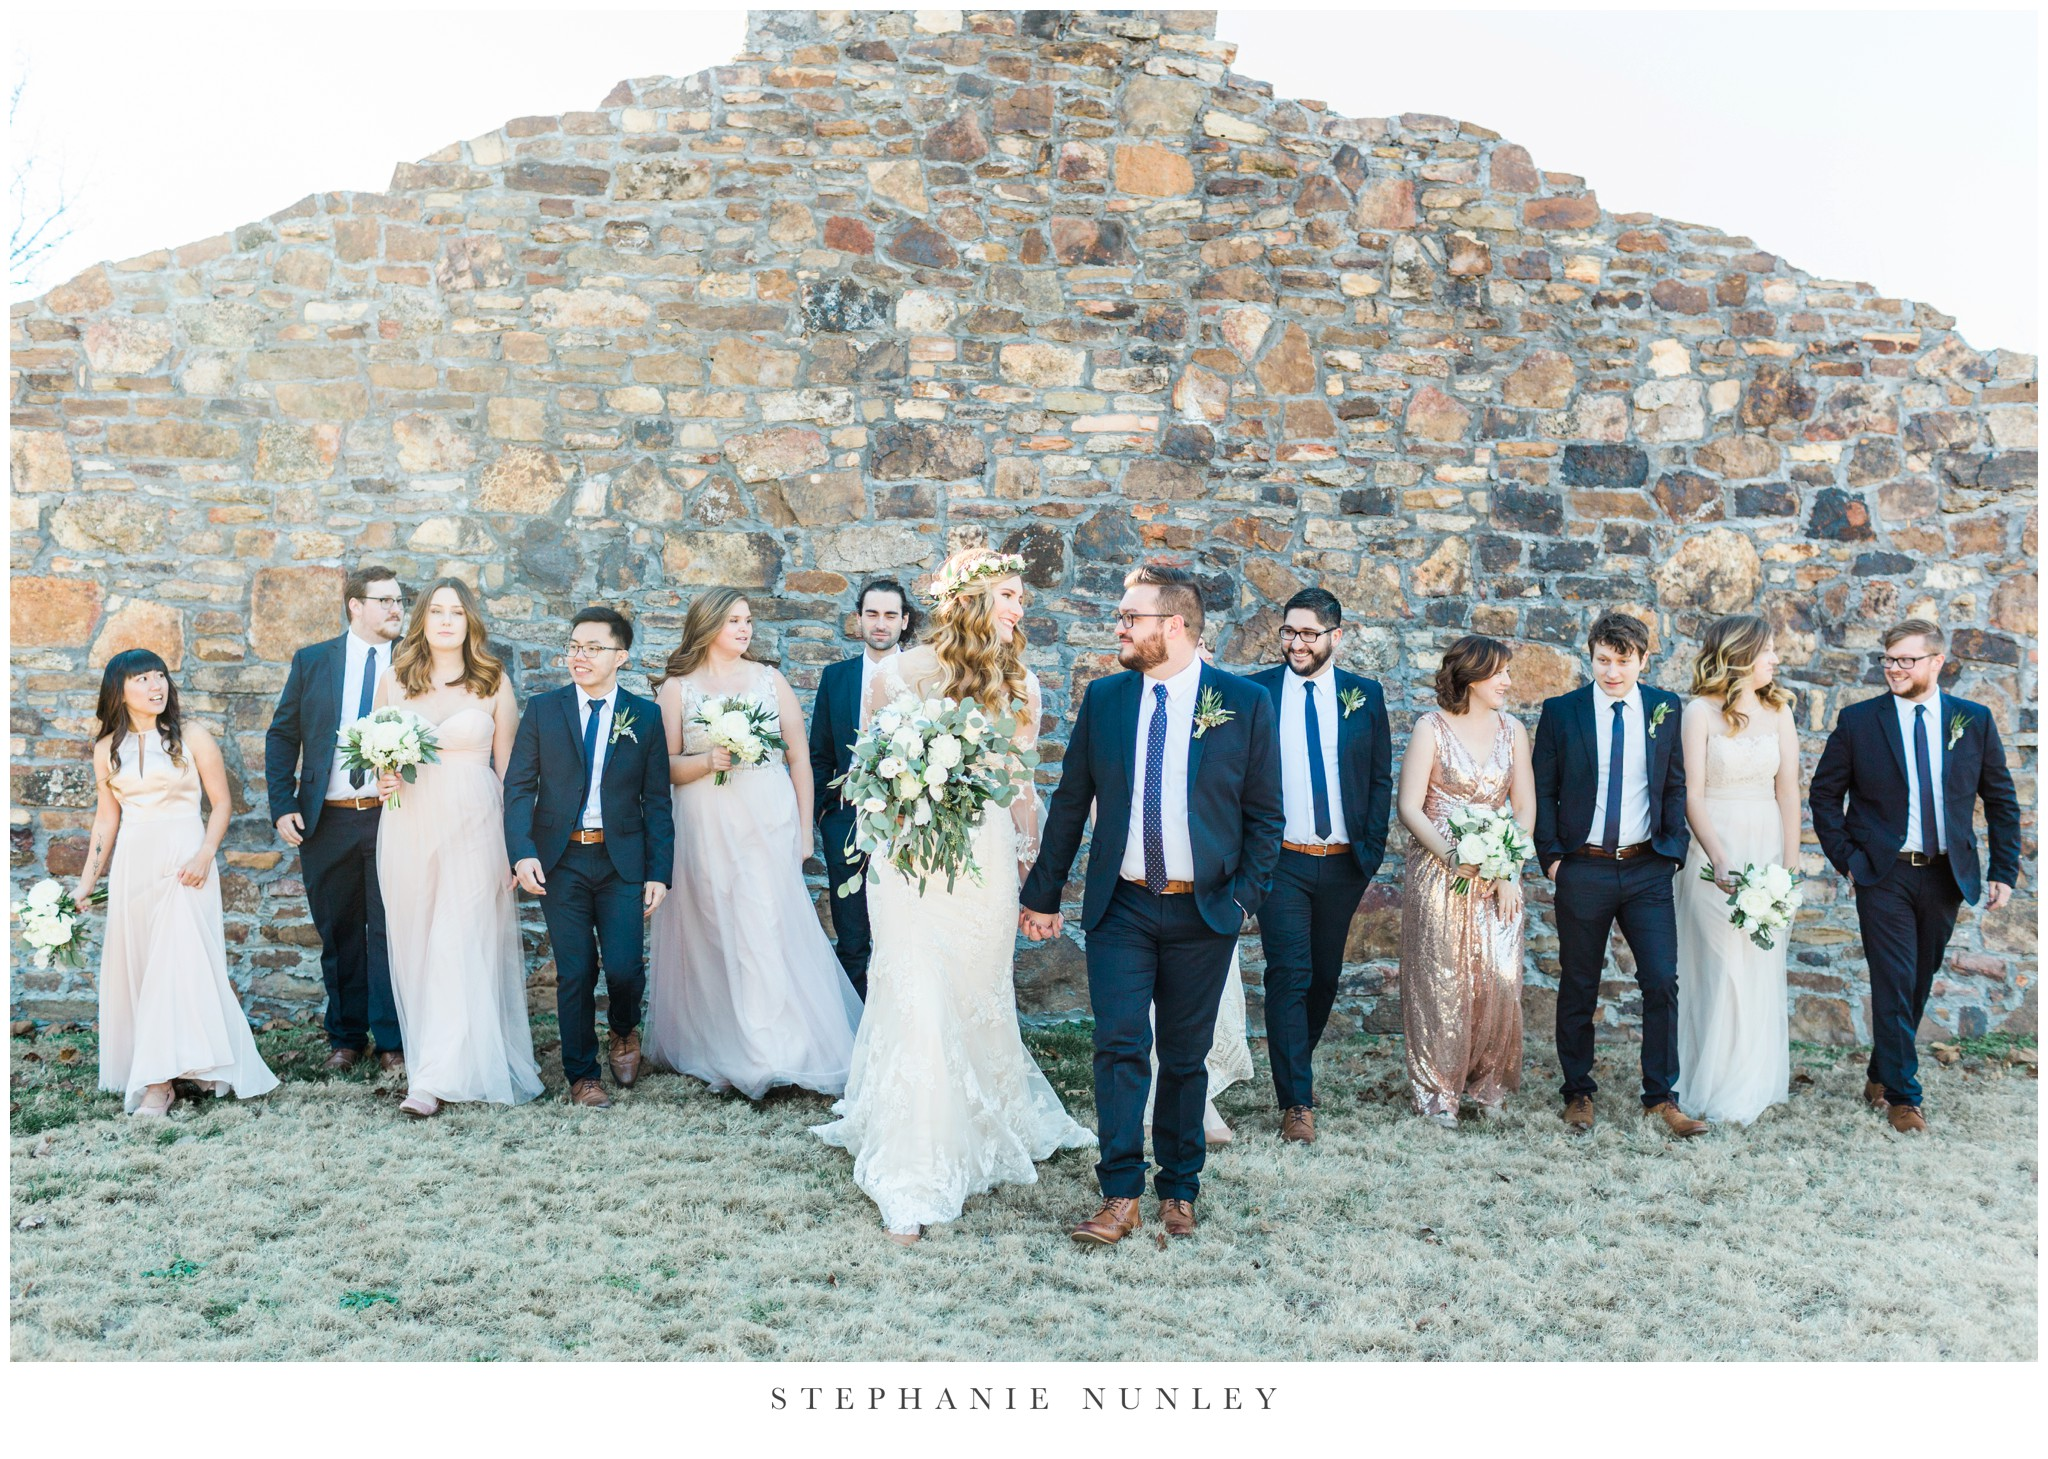 sassafrass-springs-vineyard-film-wedding-photos-46.jpg